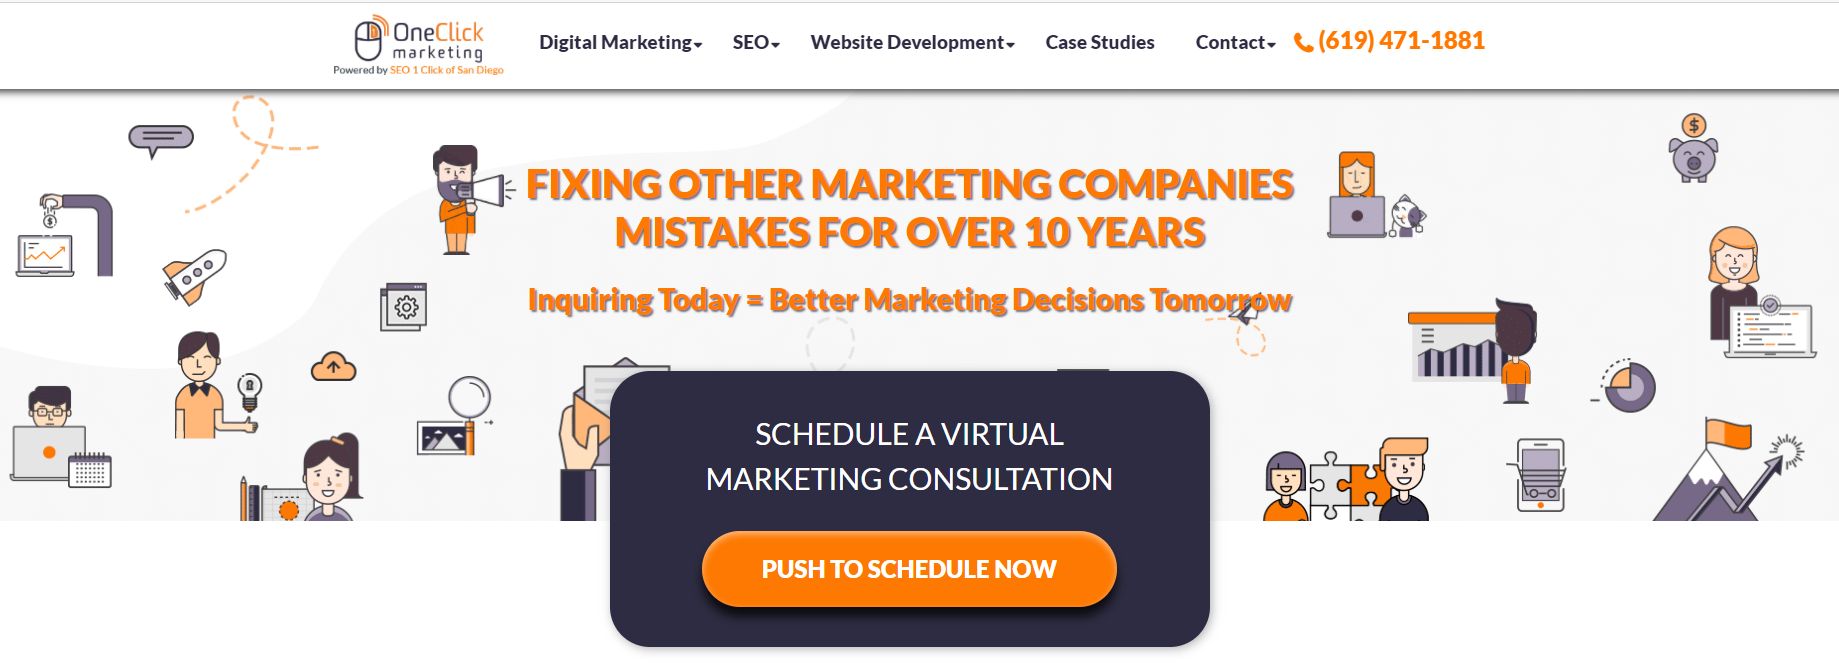 One Click SEO Marketing of San Diego